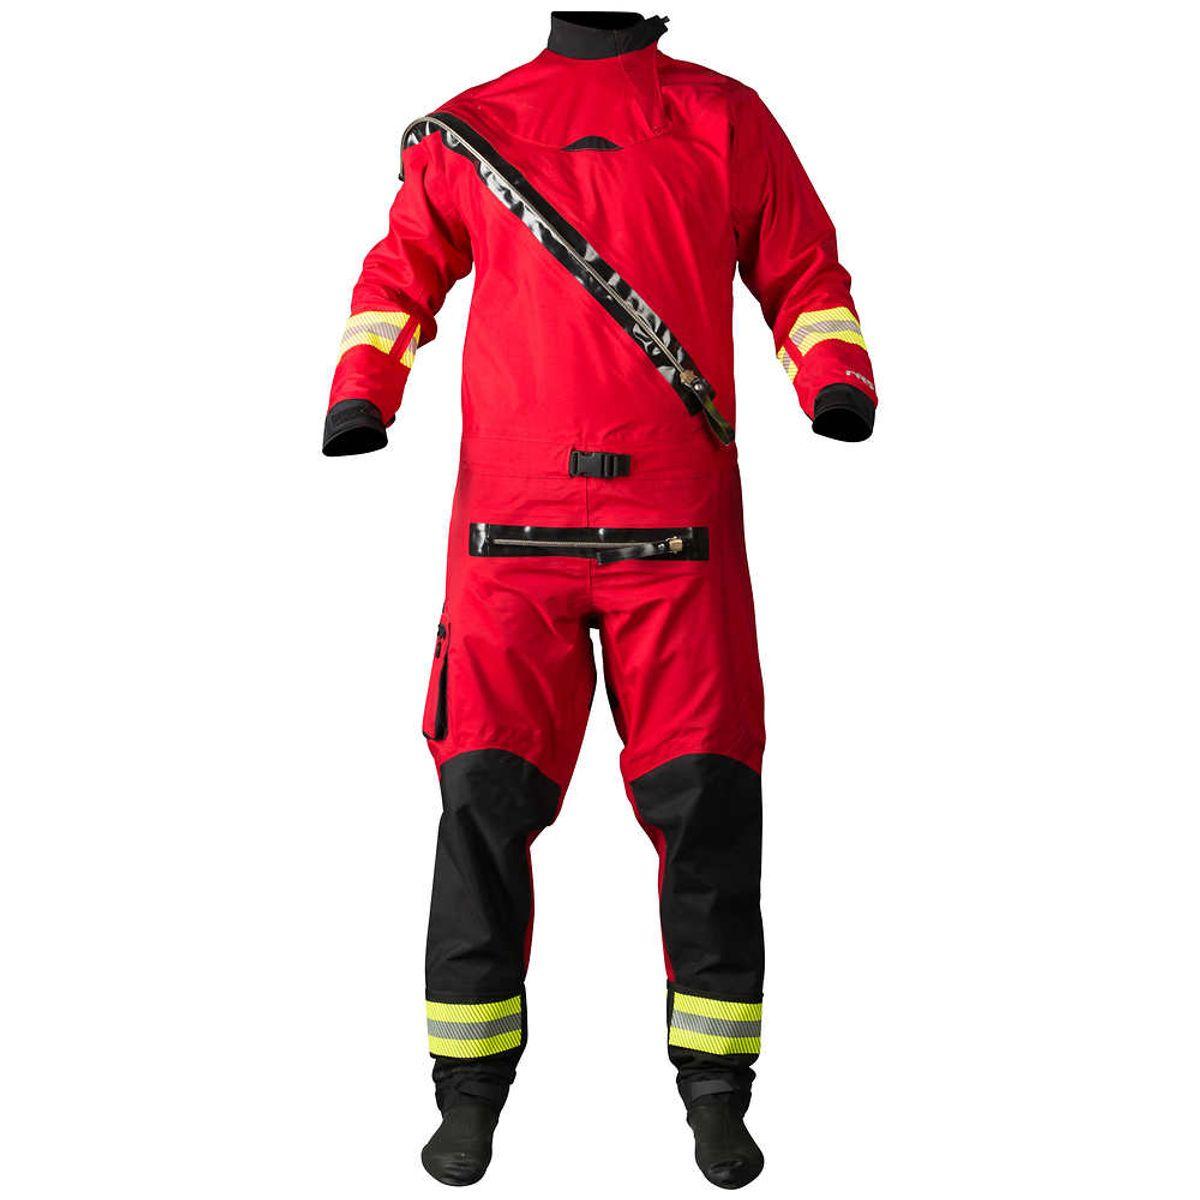 NRS Extreme SAR Drysuit Image